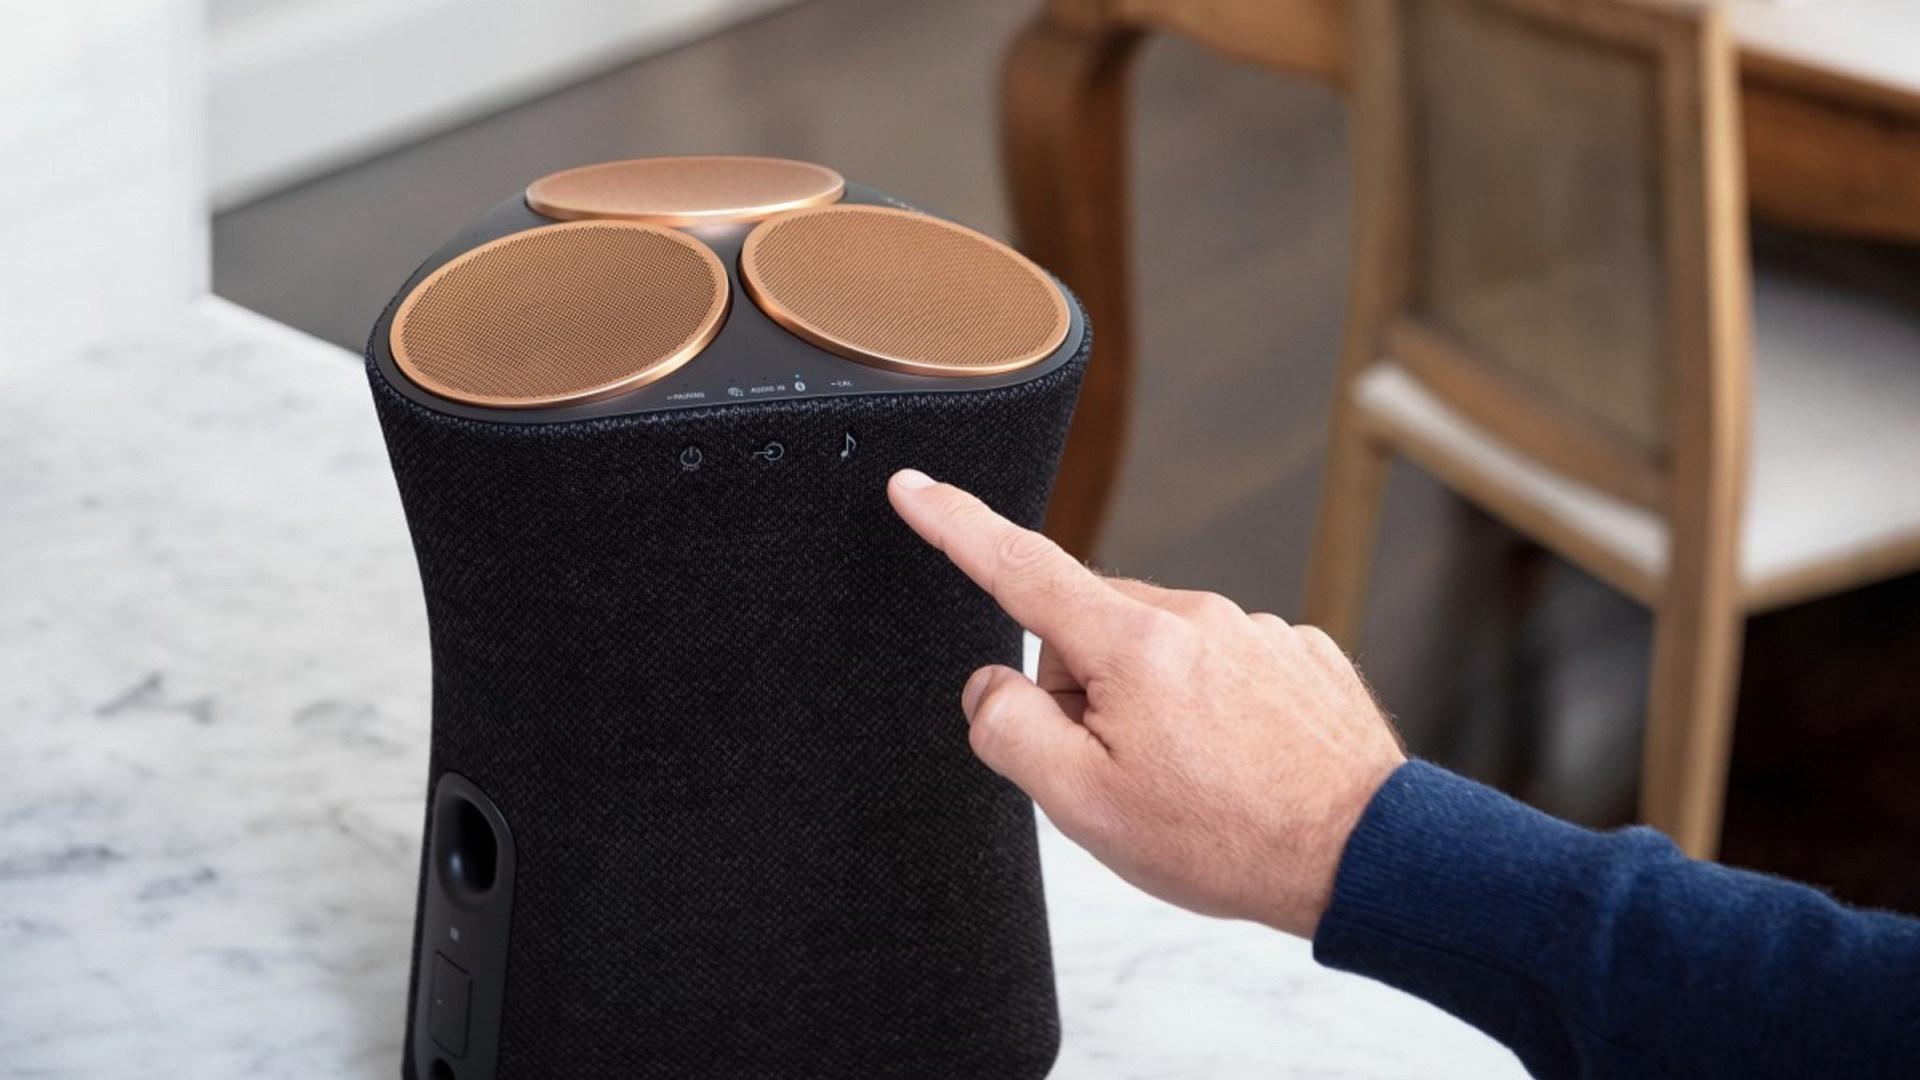 Sony, Lautsprecher, speaker, 360 Grad, SRS-RA3000, SRS-RA5000